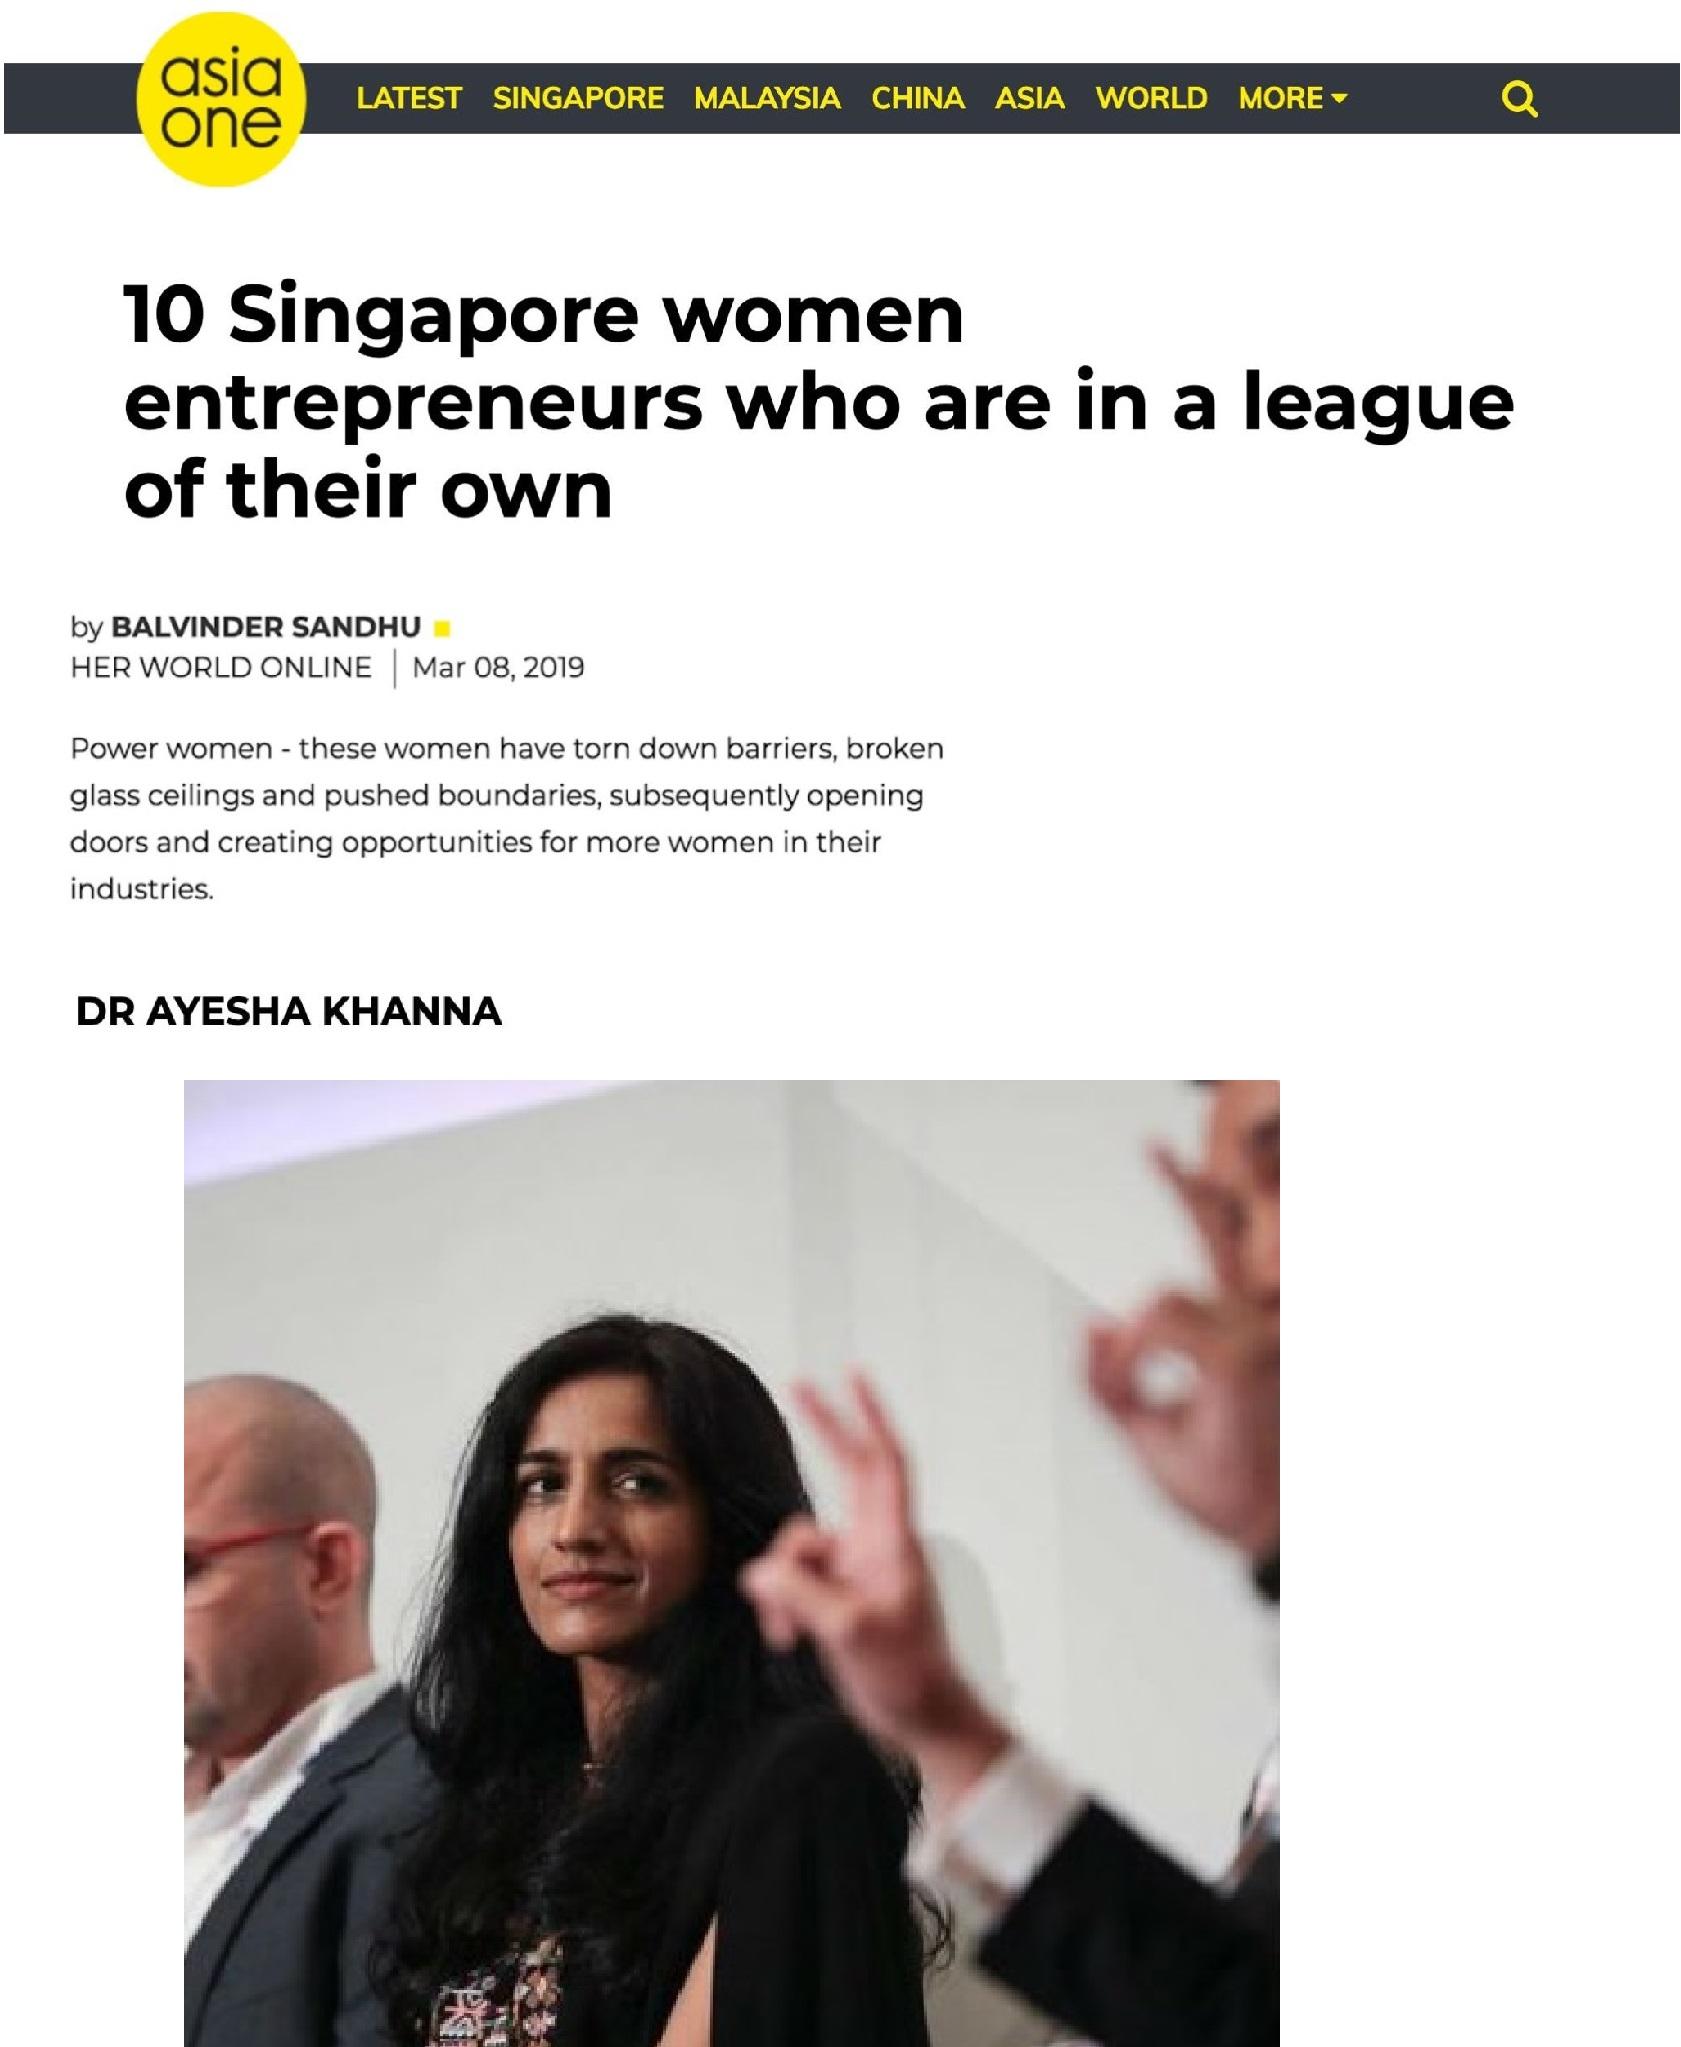 Ayesha Khanna - Asia One 4 .jpg